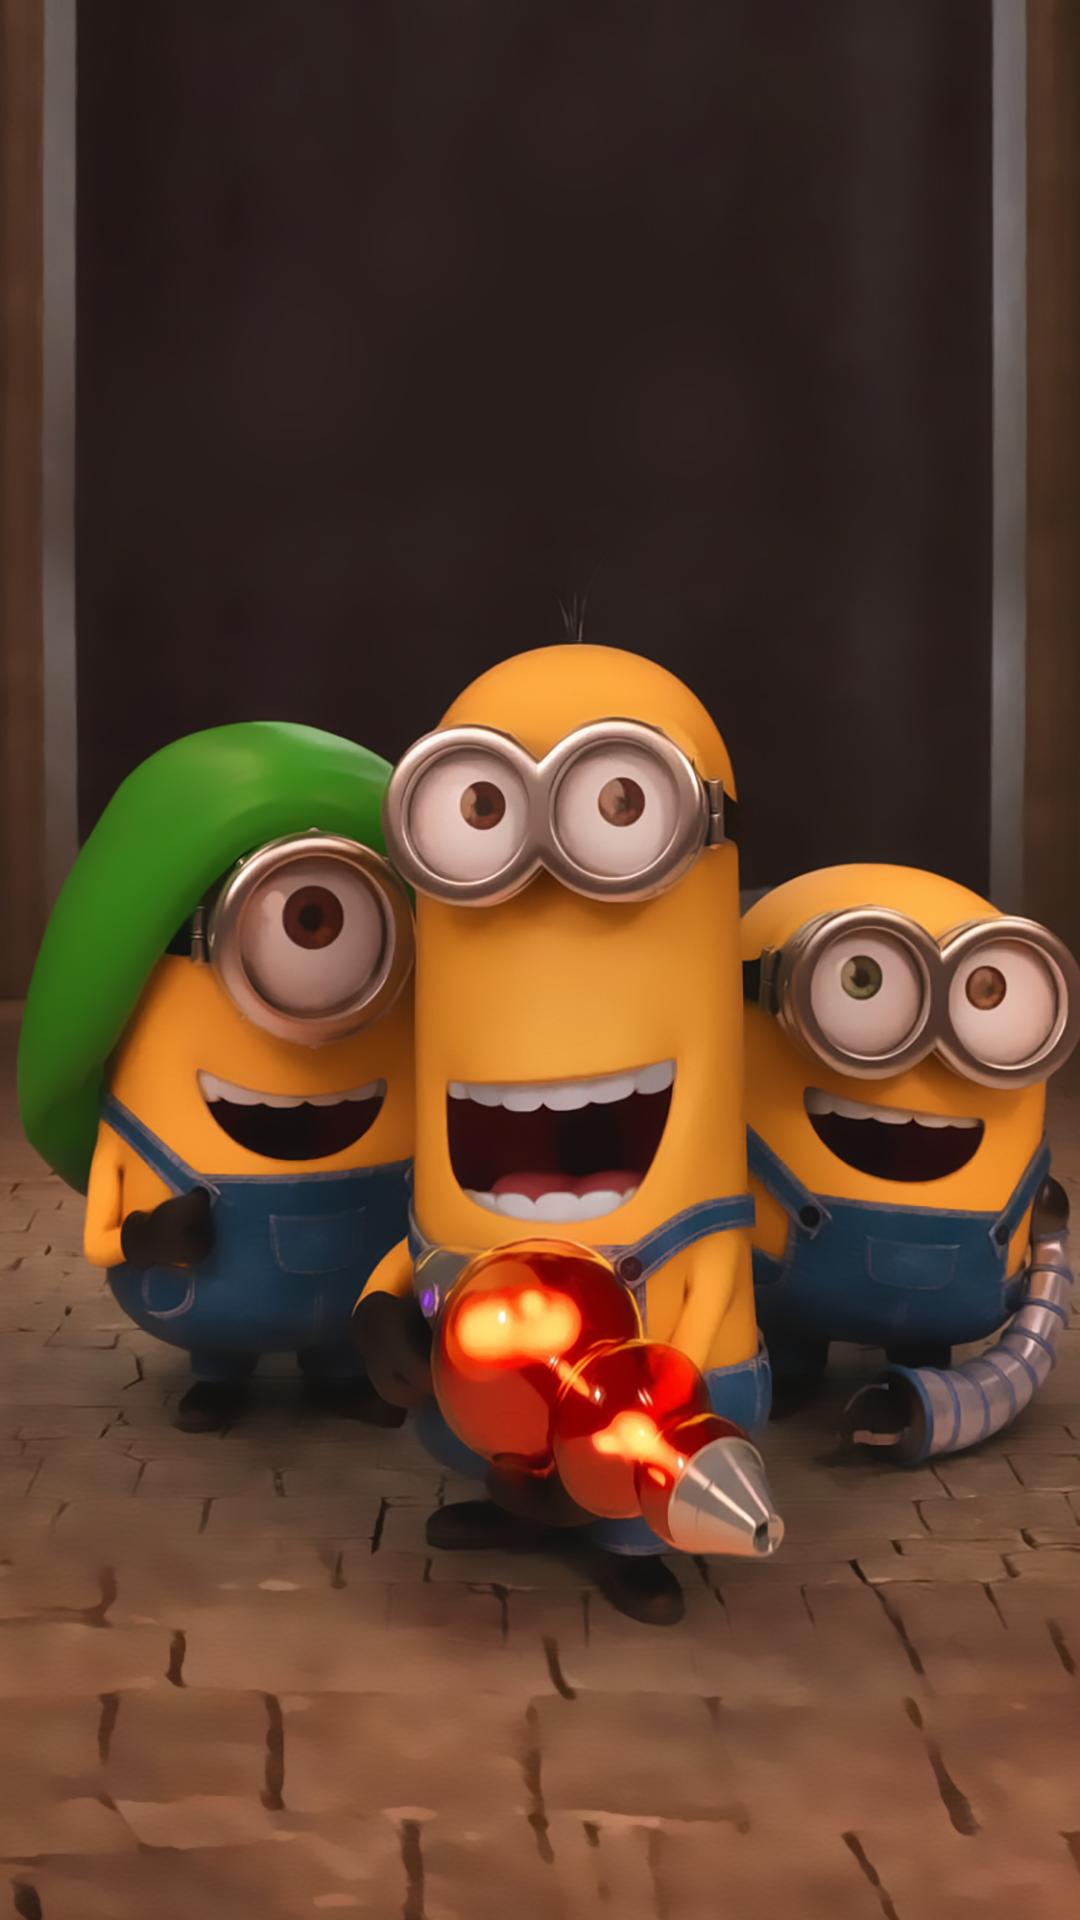 Attacke Jetzt Oder Nie 😀 Minions Minions